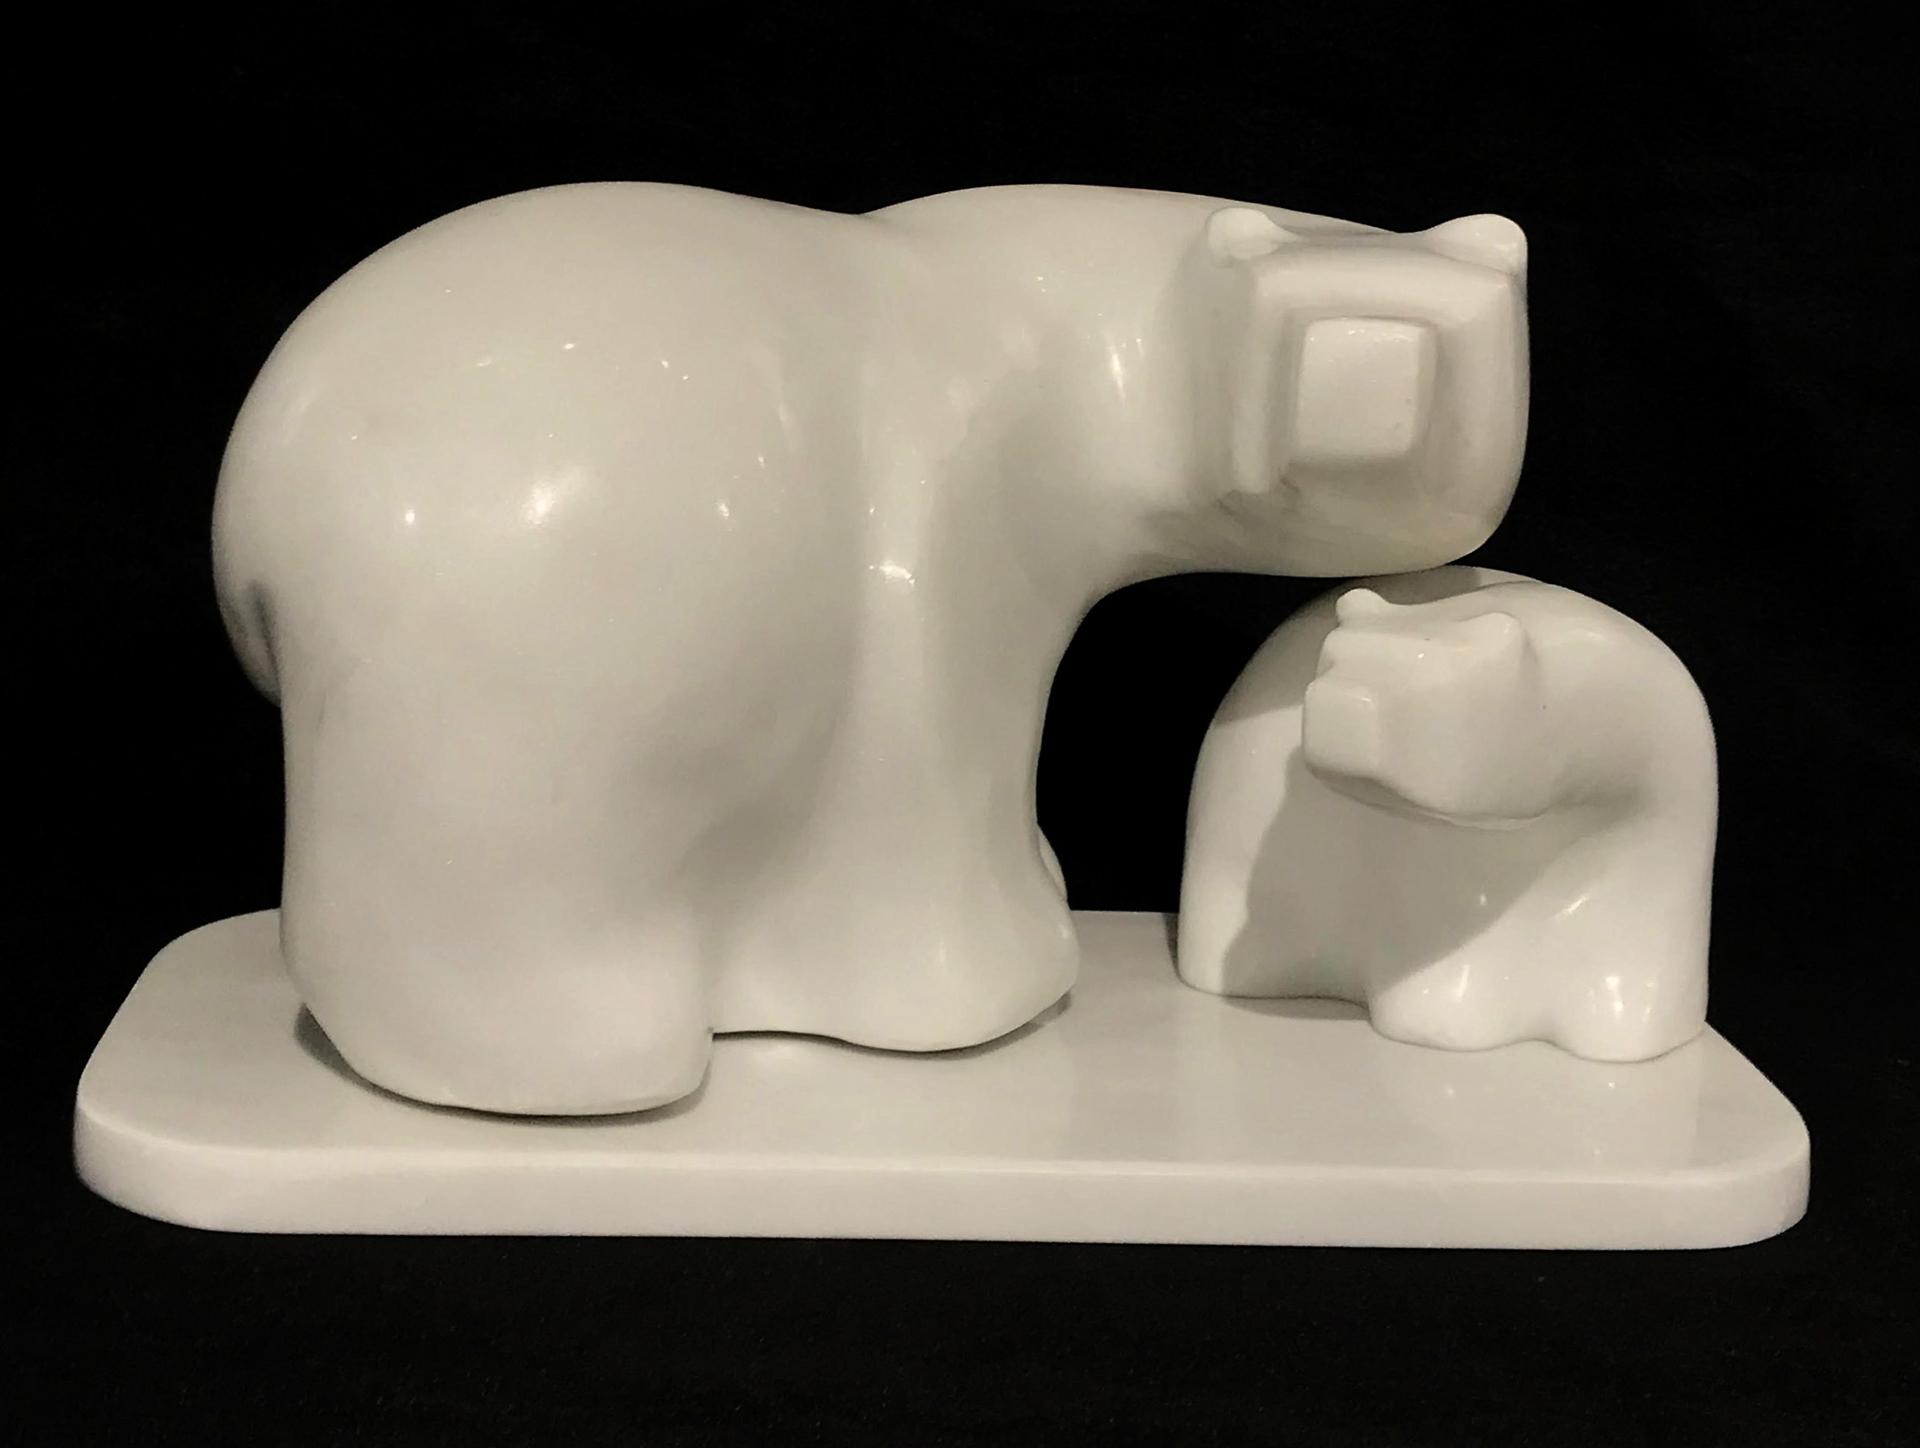 Bear and Cub 76 by Gert Olsen